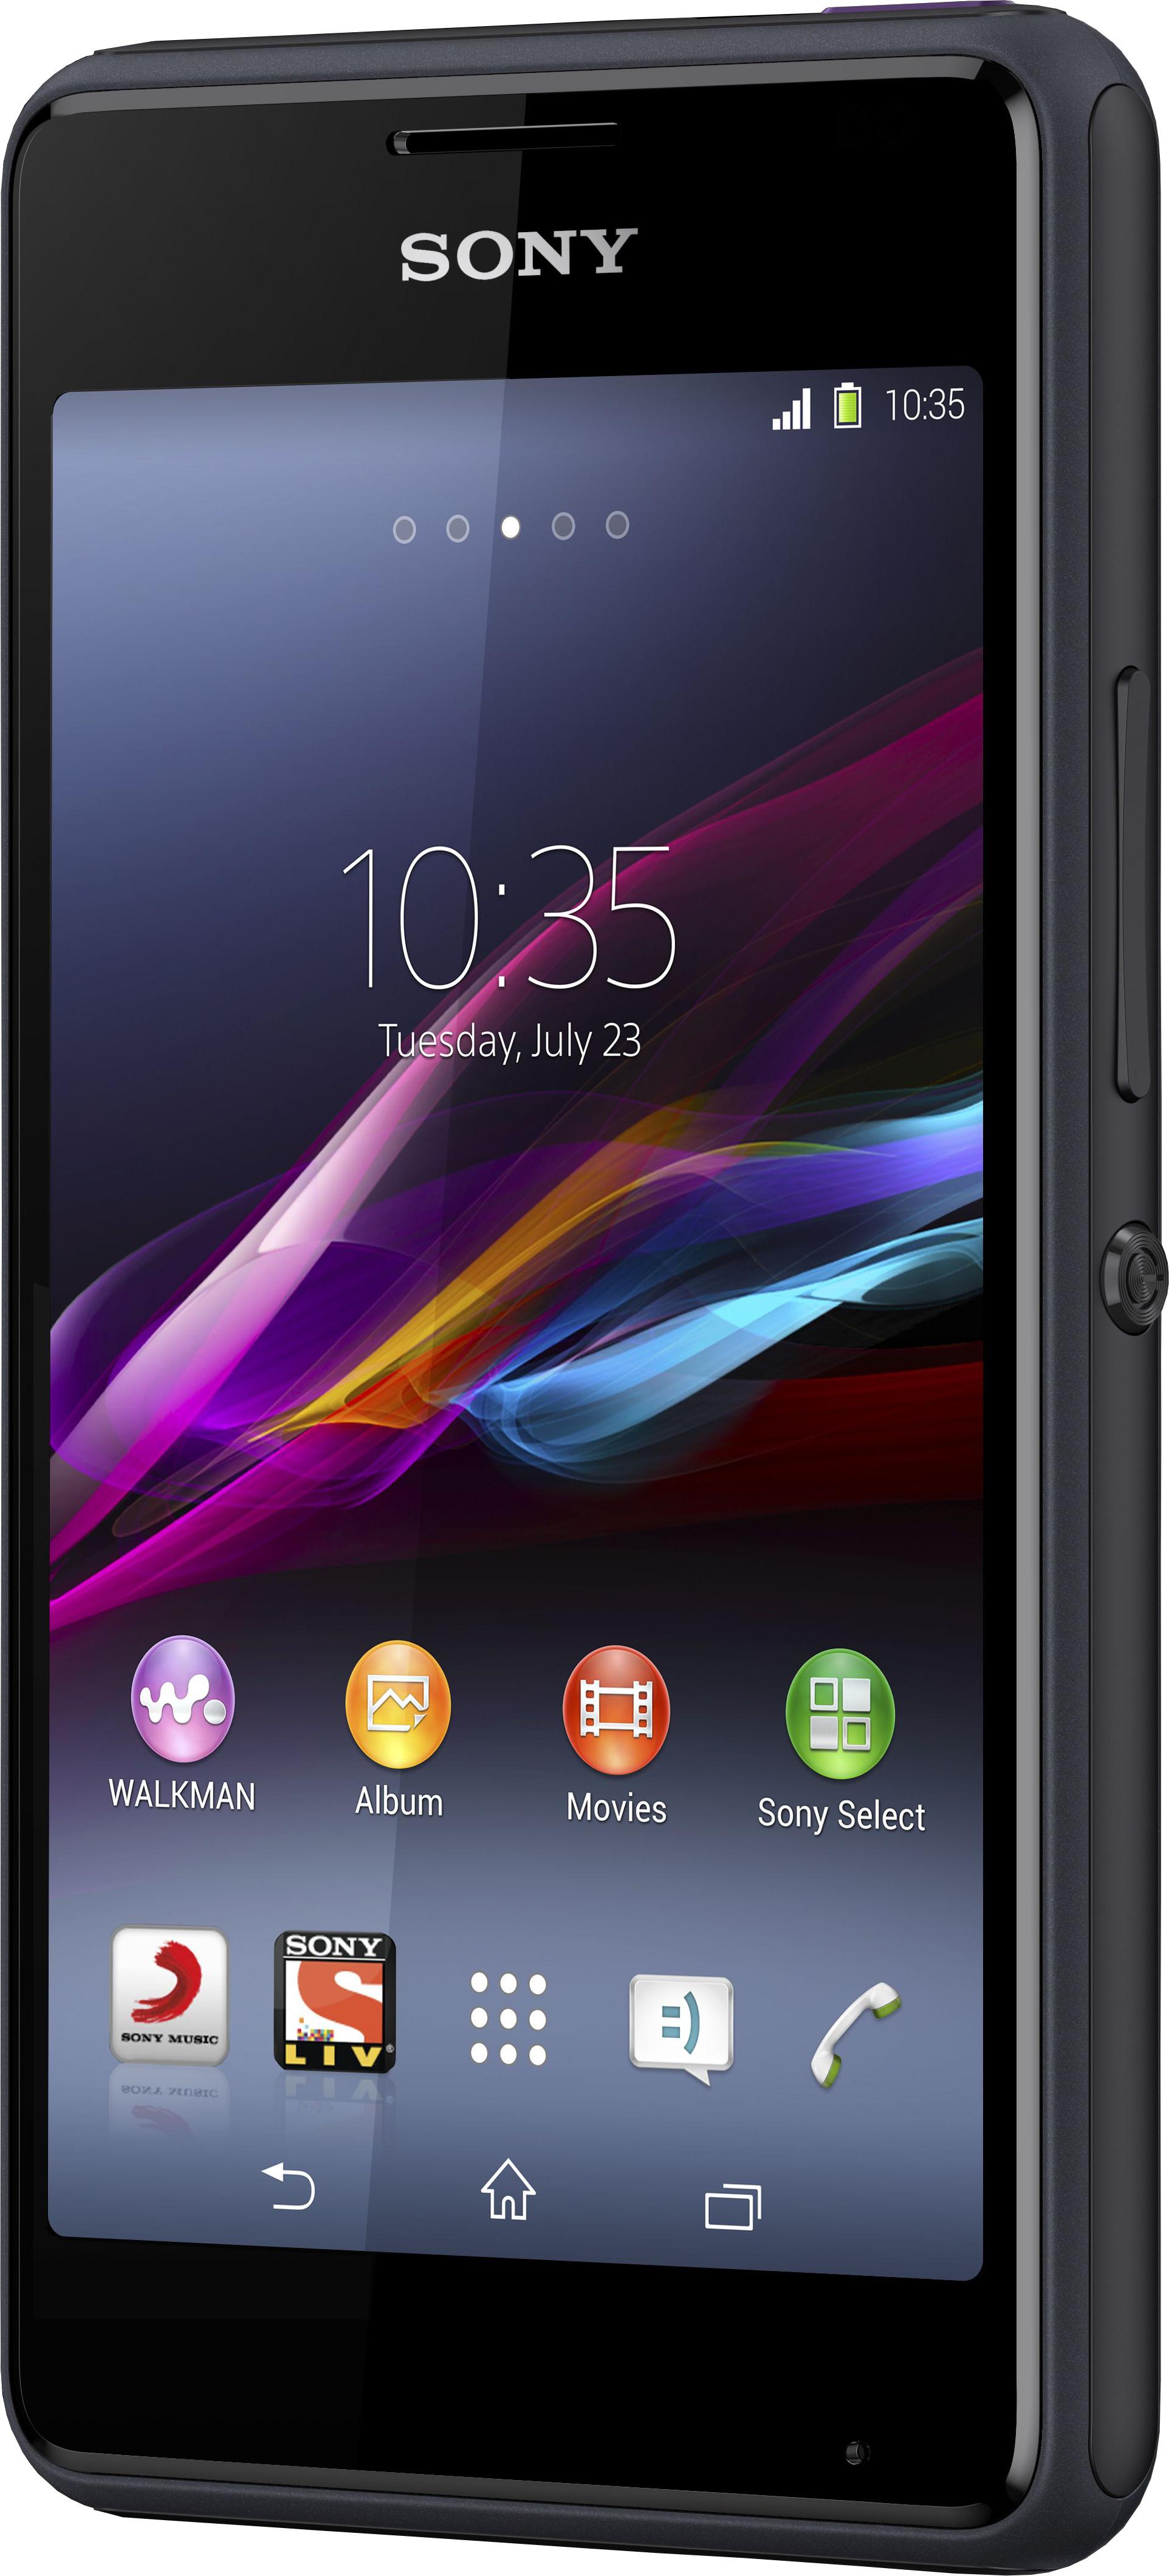 Sony Xperia E1 (512MB RAM, 4GB)